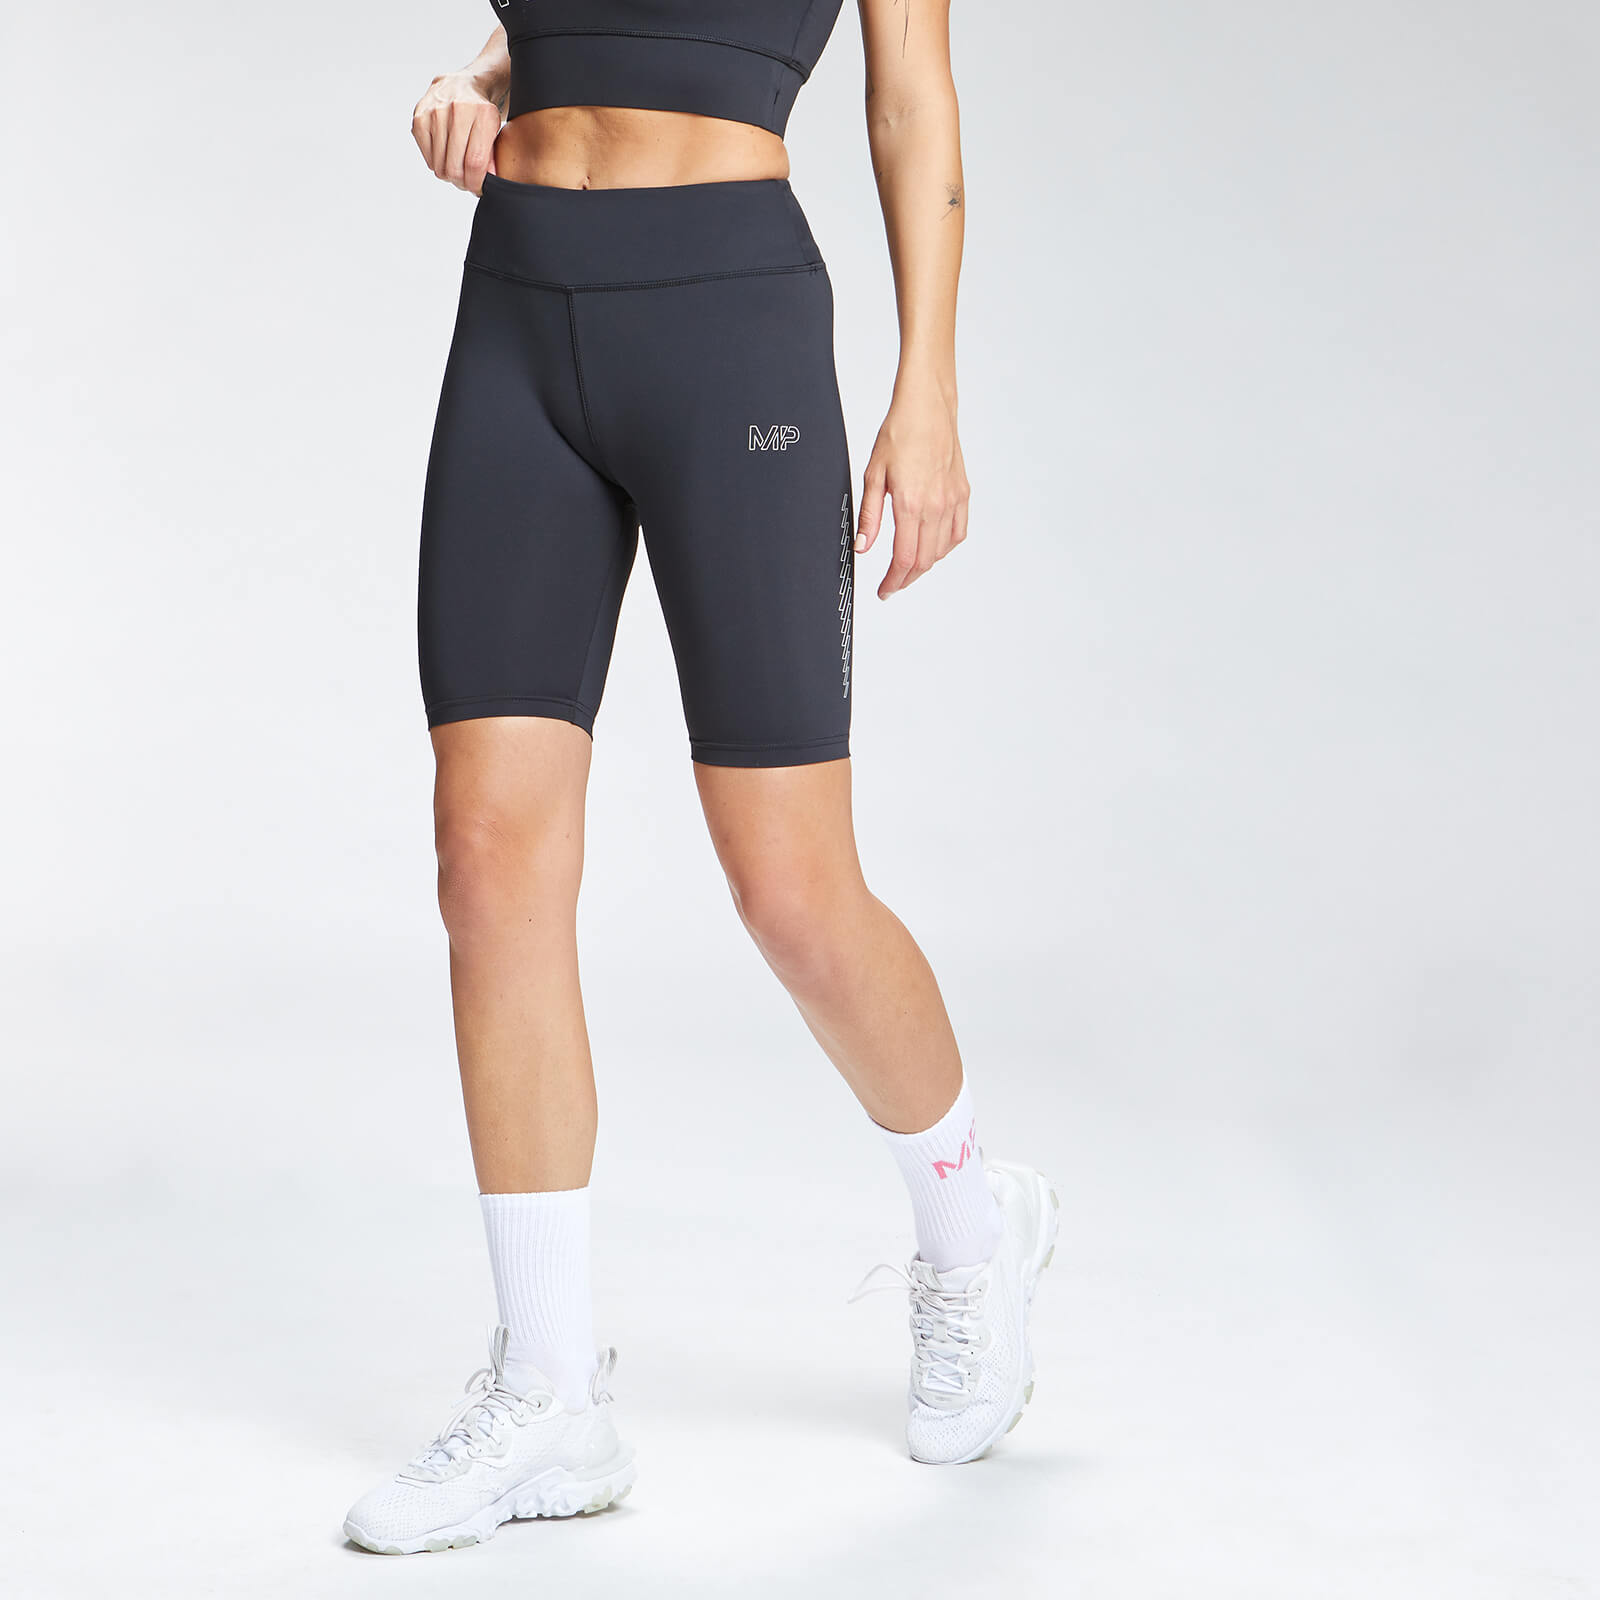 Купить MP Women's Repeat Mark Graphic Training Cycling Shorts - Black - XXS, Myprotein International